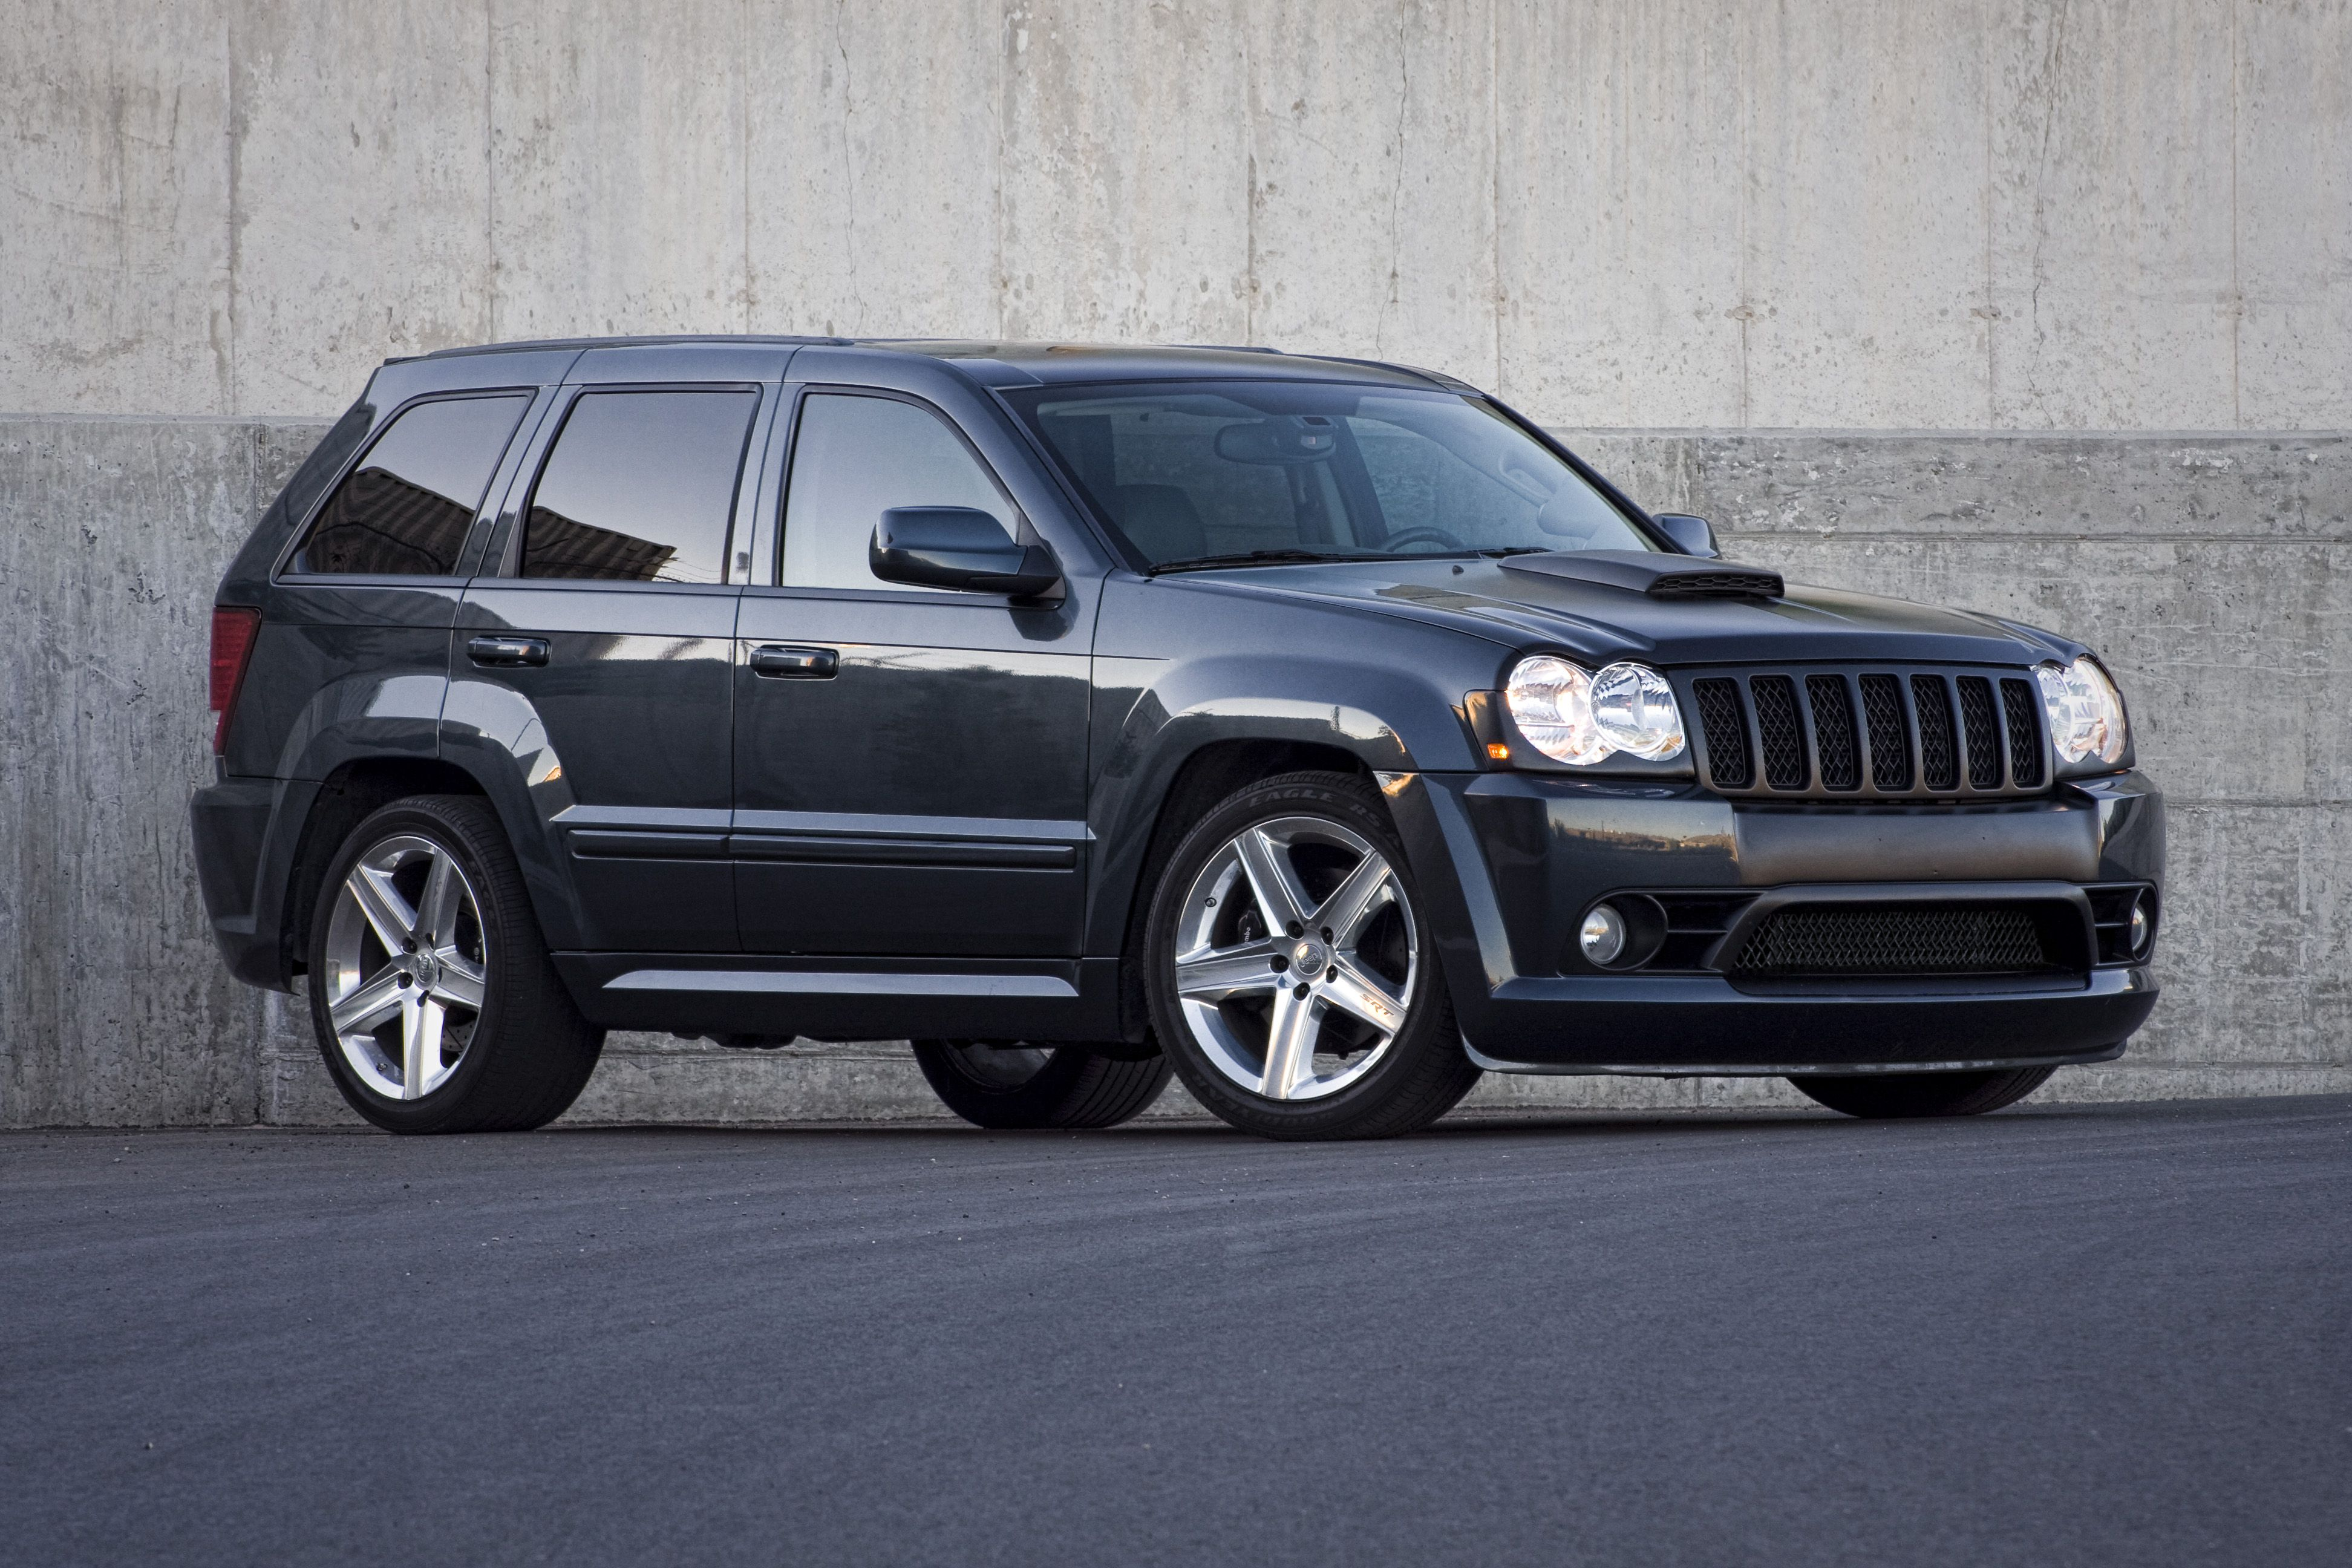 Grand cherokee srt 8 srt8 jeeps pinterest cherokee jeeps and jeep grand cherokee